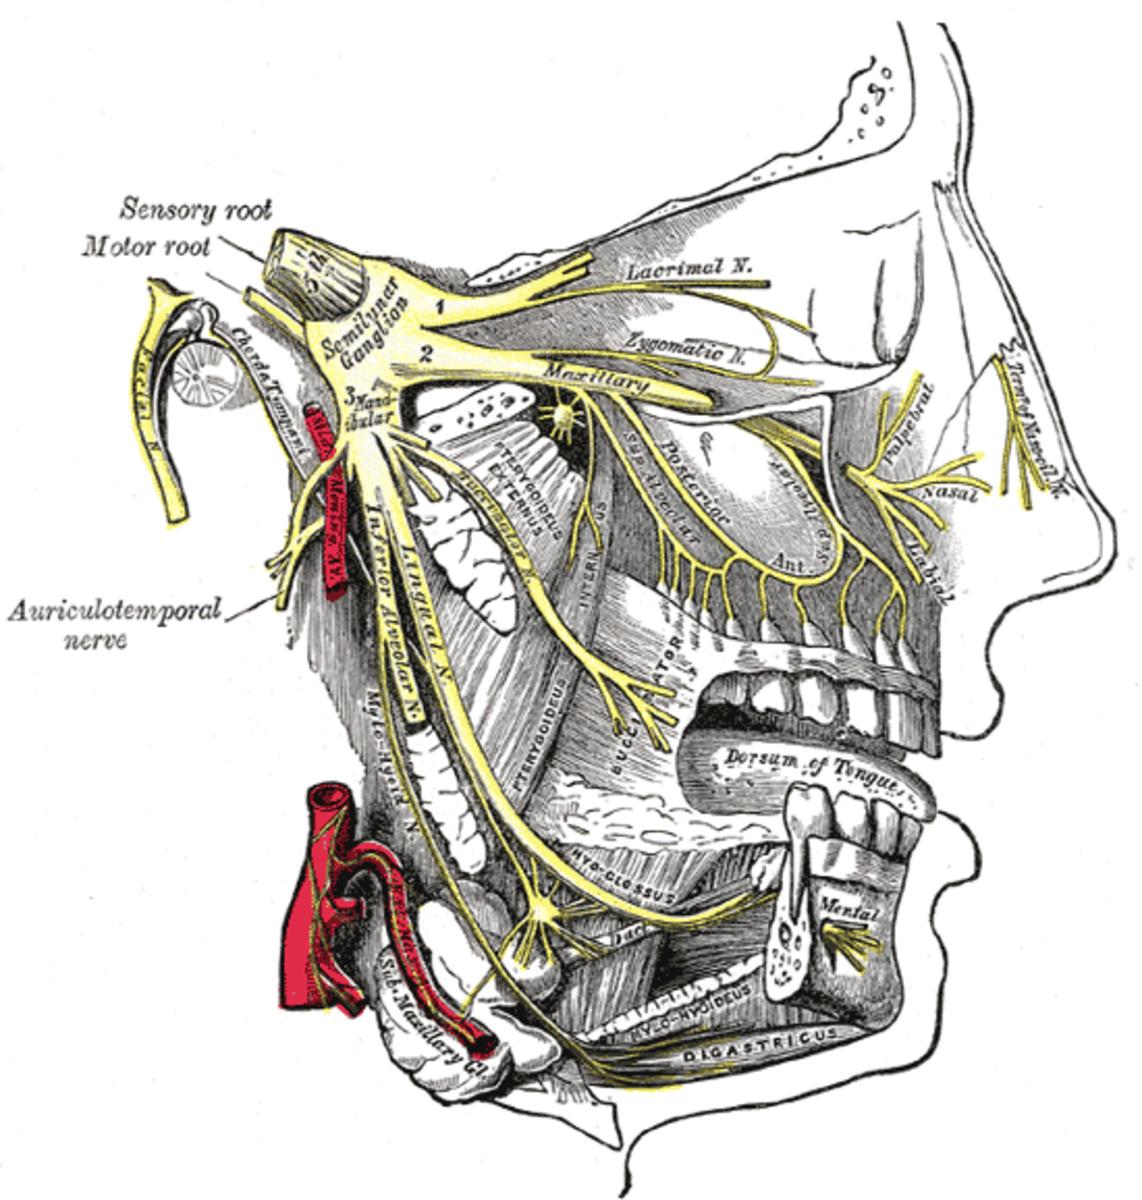 facts-tic-douloureux-trigeminal-neuralgia